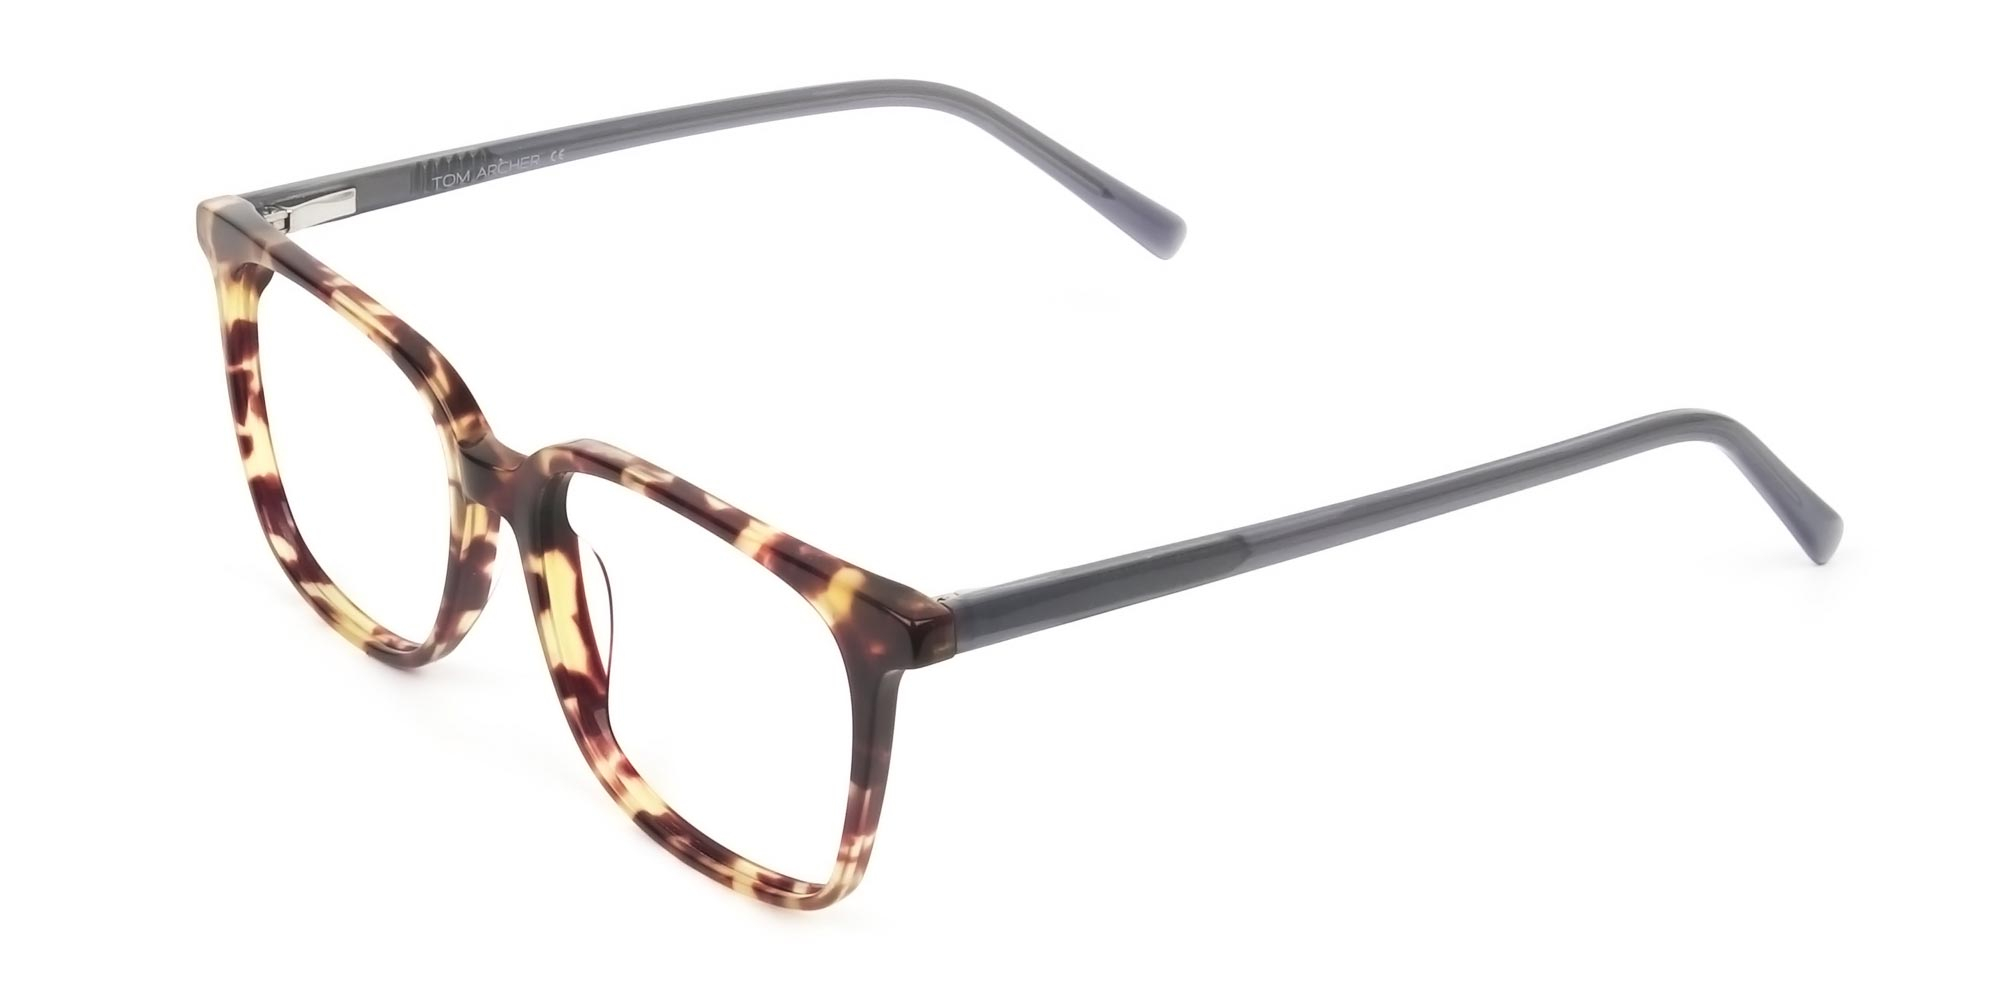 dustygrey-tortoise-shell-square-glasses